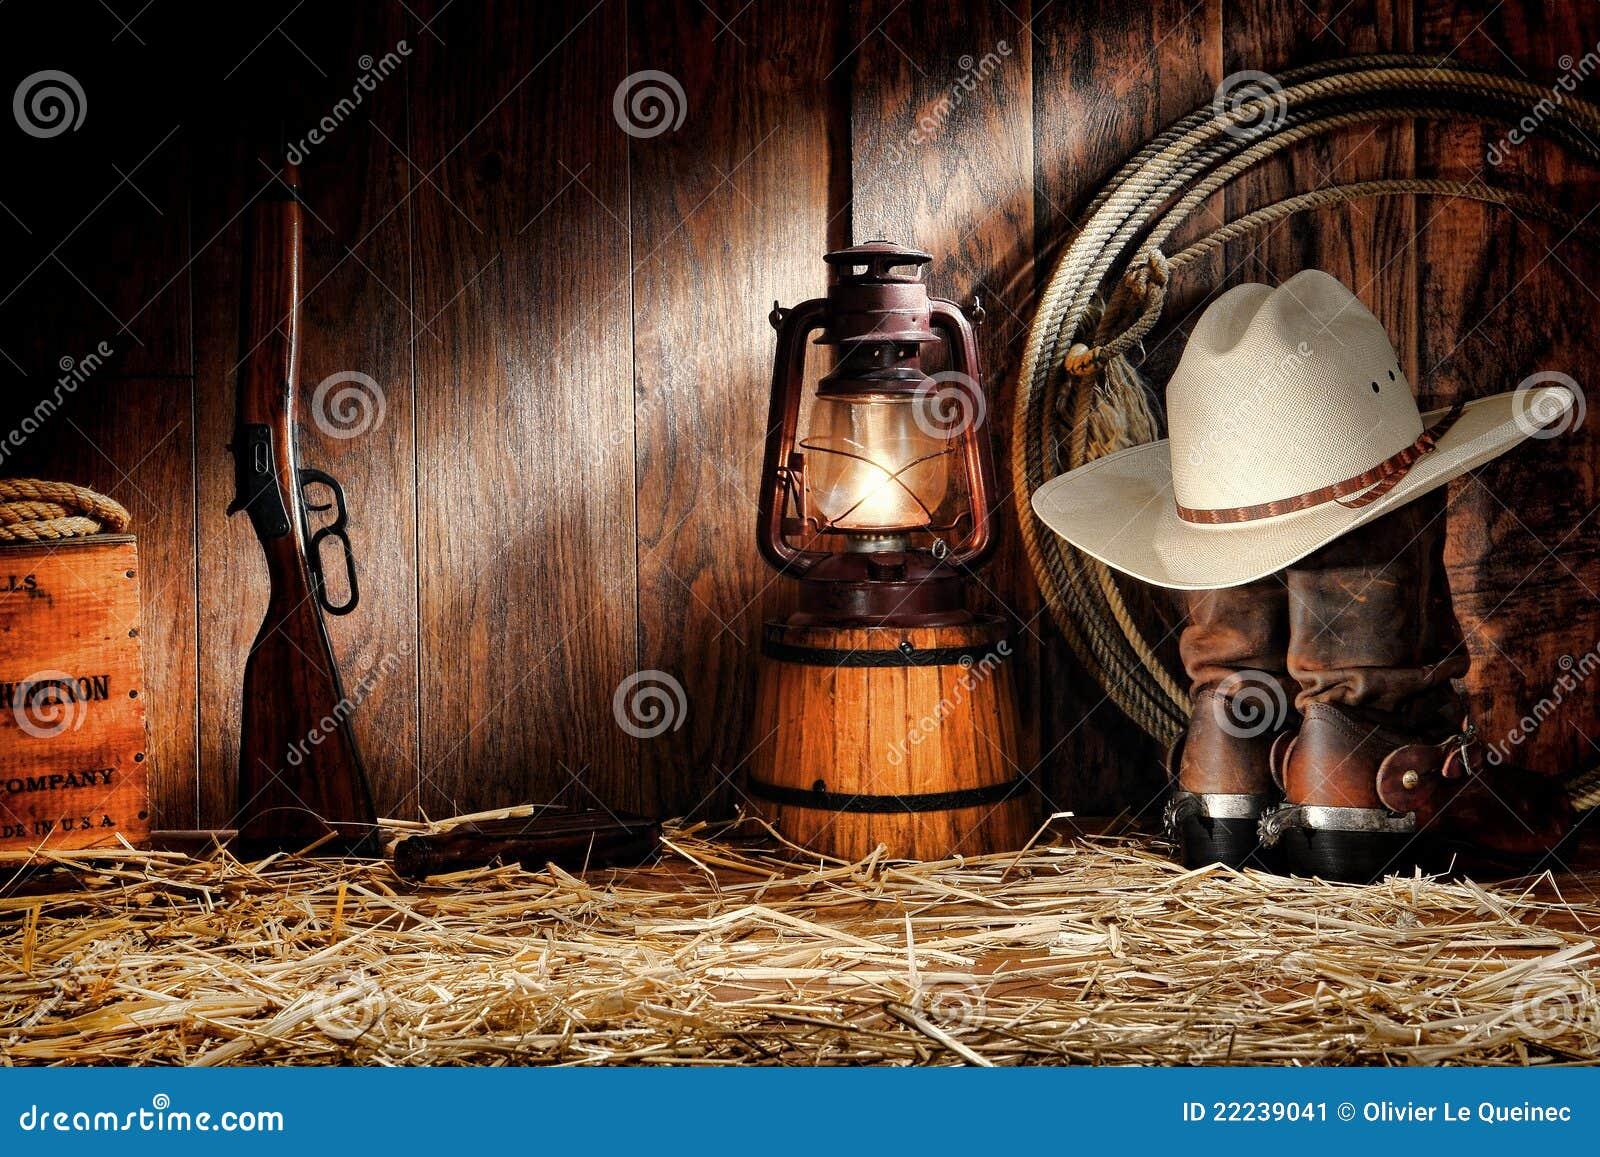 родео ranching американского амбара старое оборудует запад